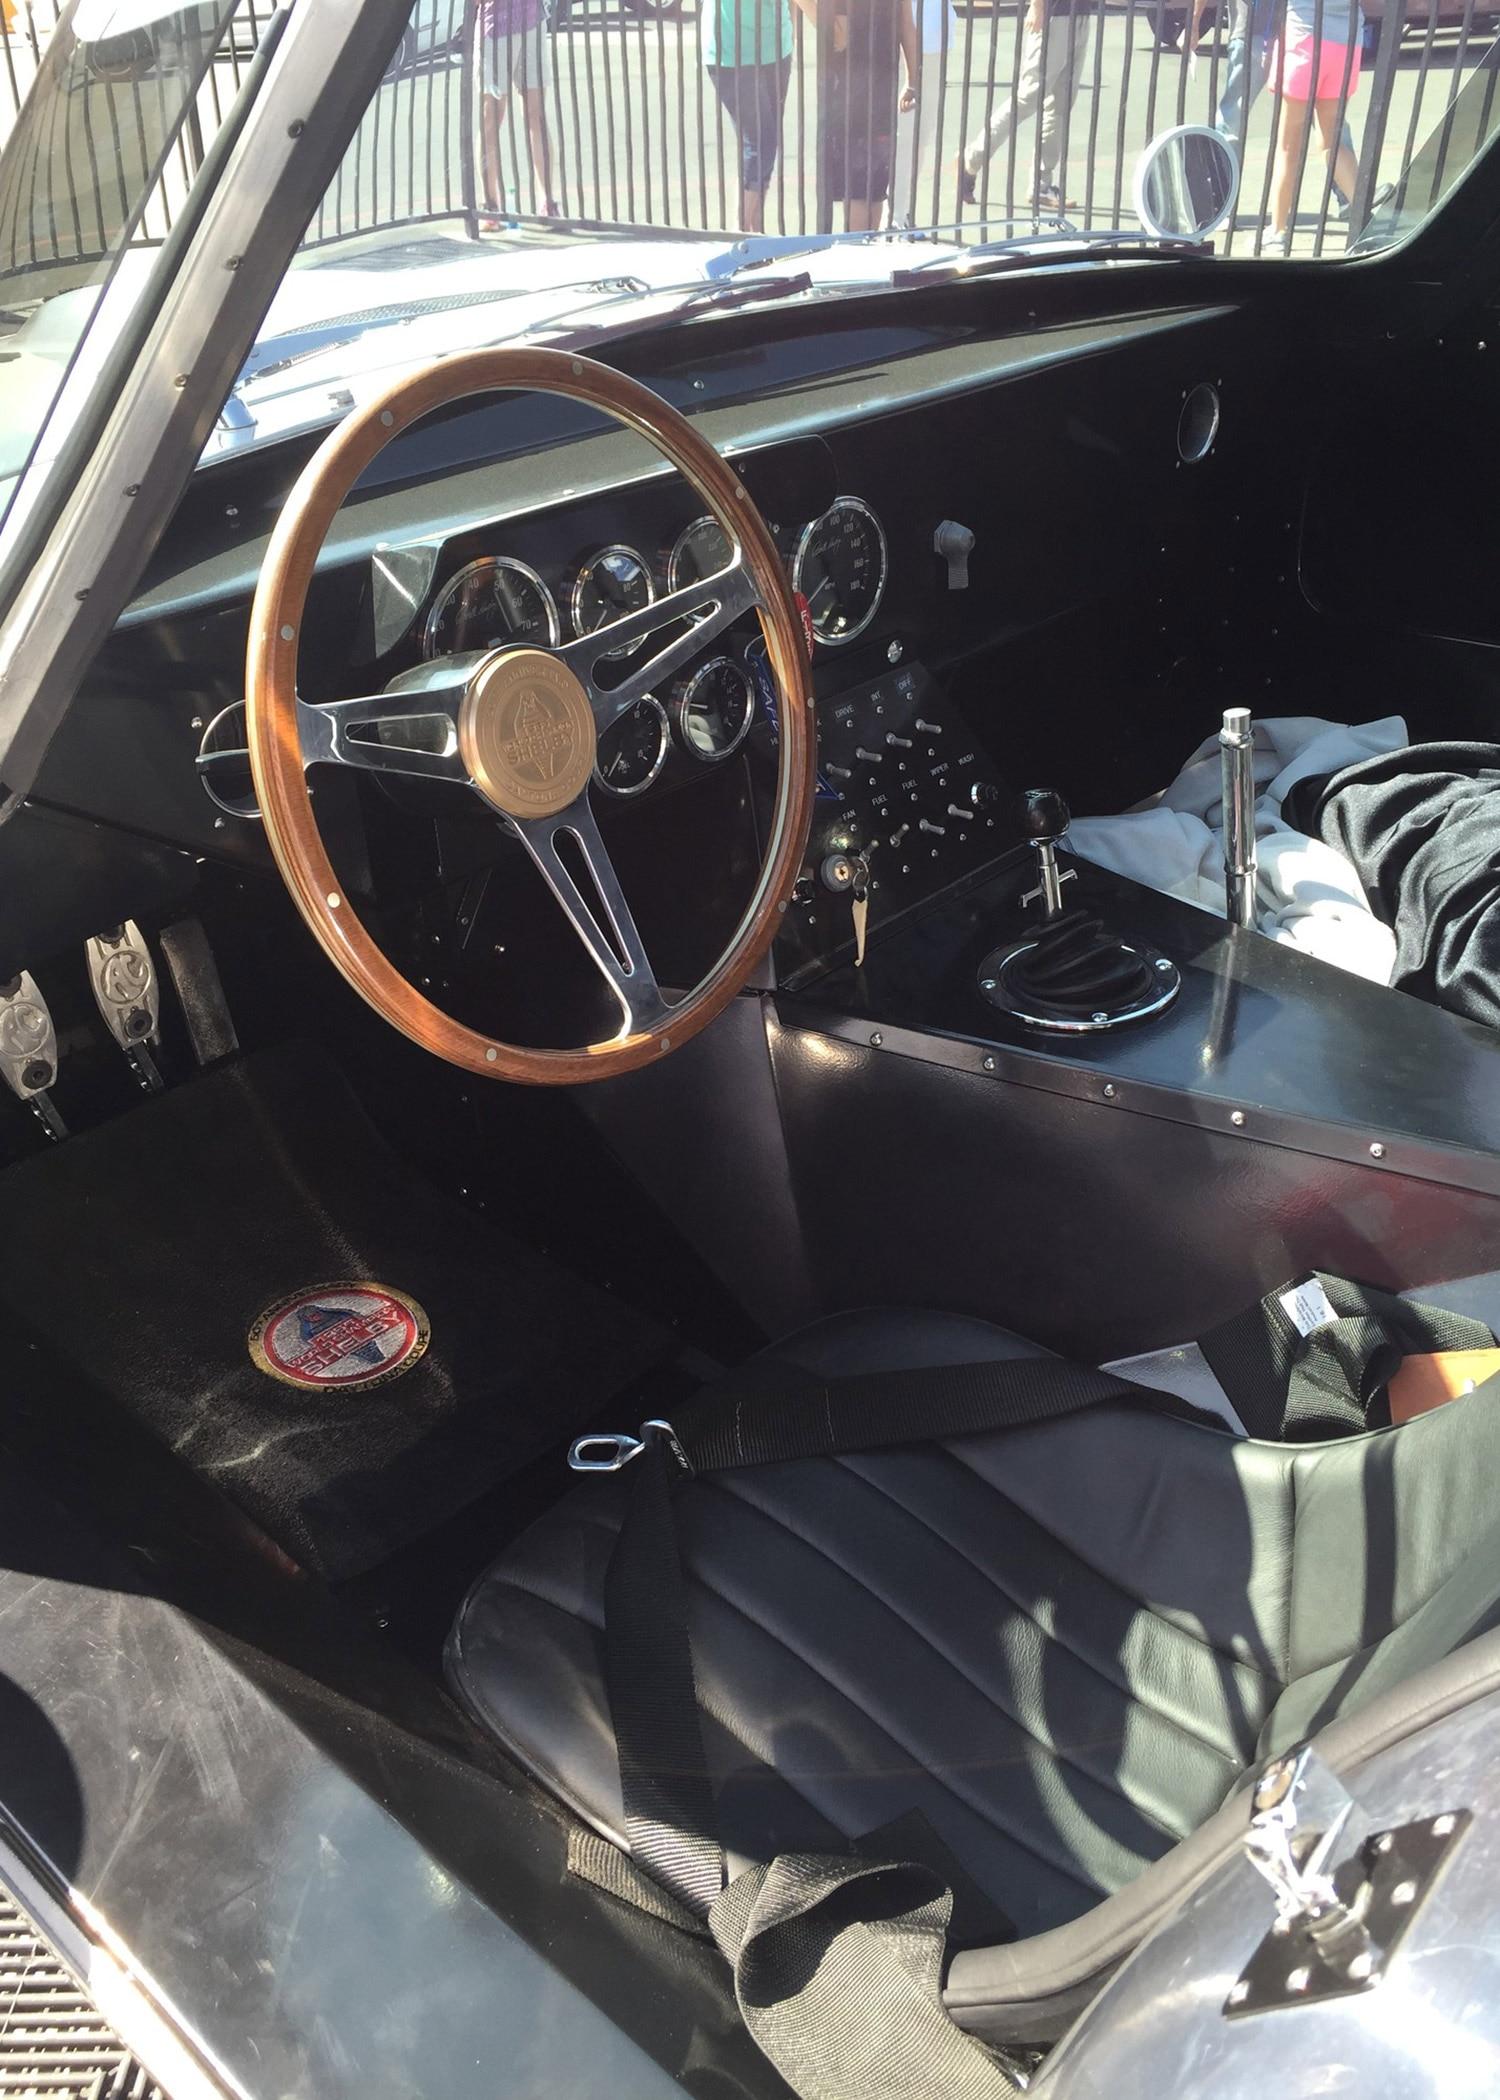 50th Anniversary Polished Shelby Daytona Coupe Interior